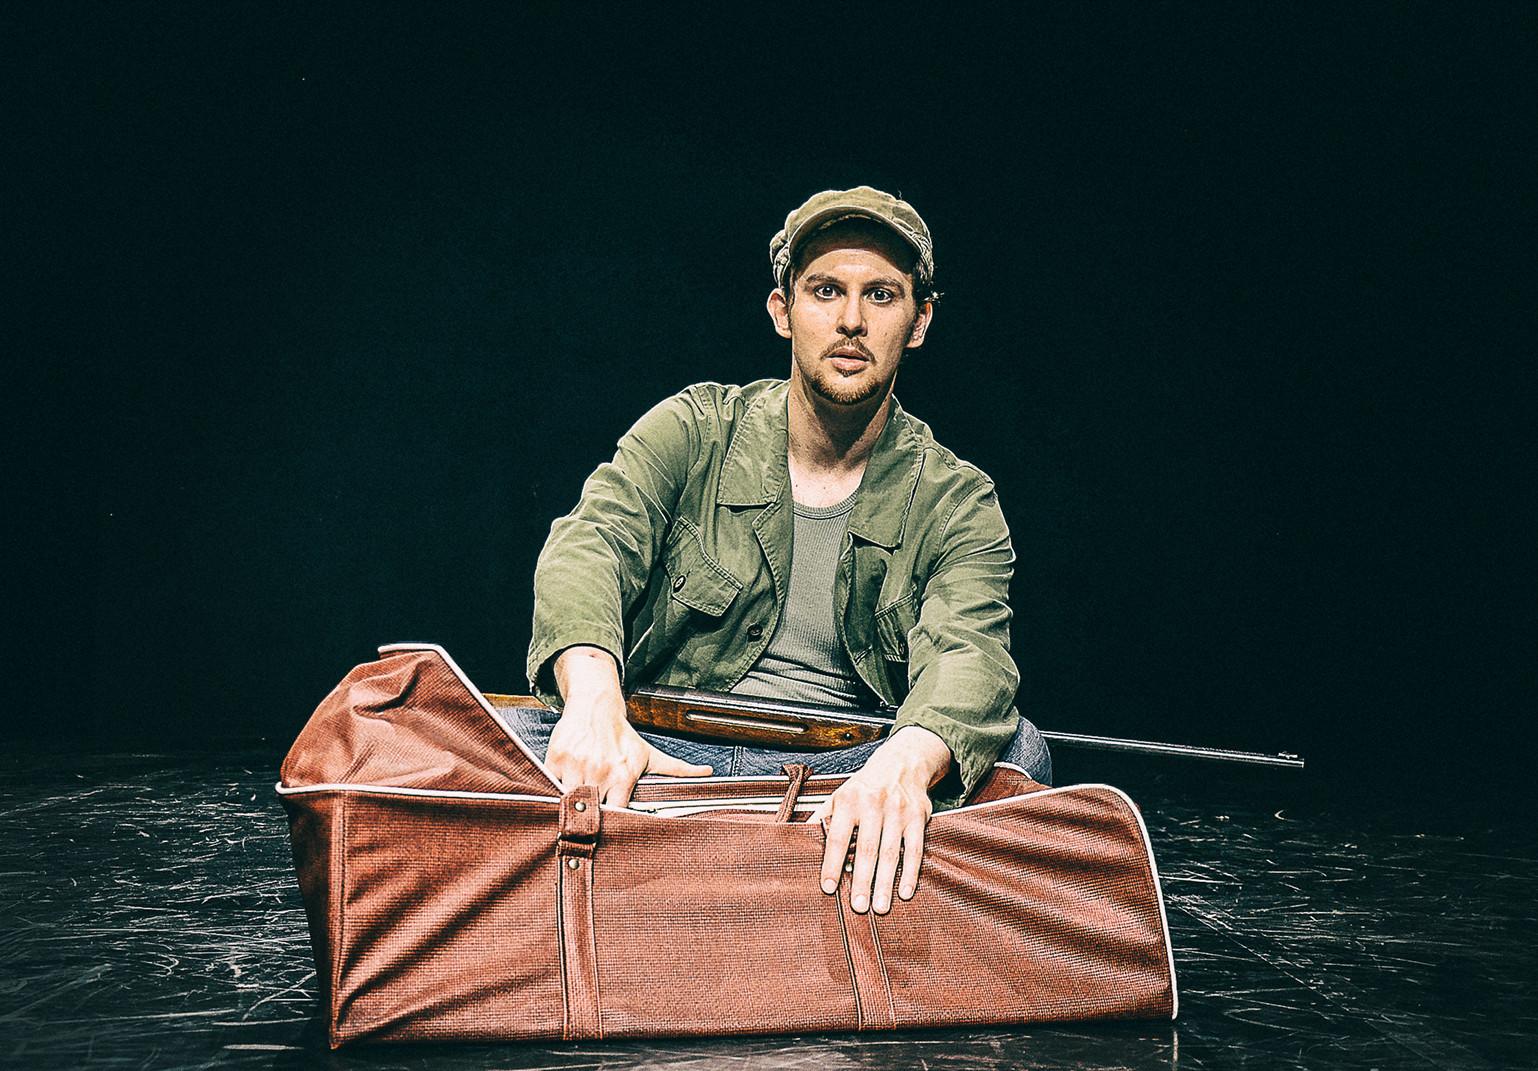 WOYZECK. Regie: Cornelia Metschitzer. Premiere: 16. September 2015. Tribüne Linz.